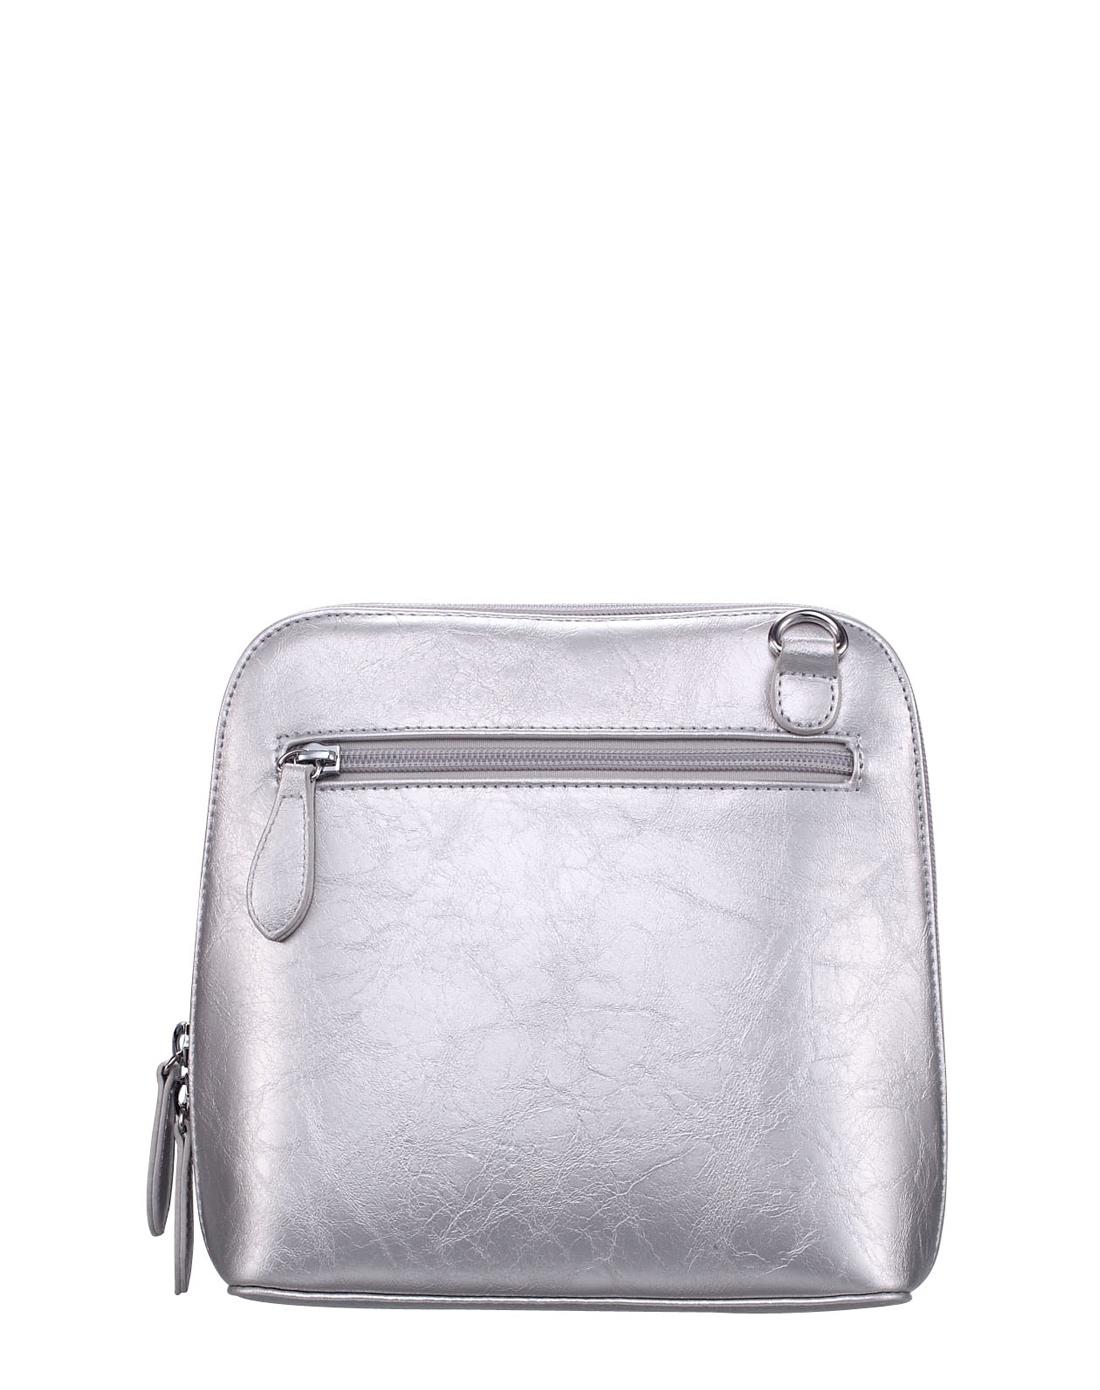 ggirl银色水桶型双背小单肩/斜挎包lfgx4j0013913